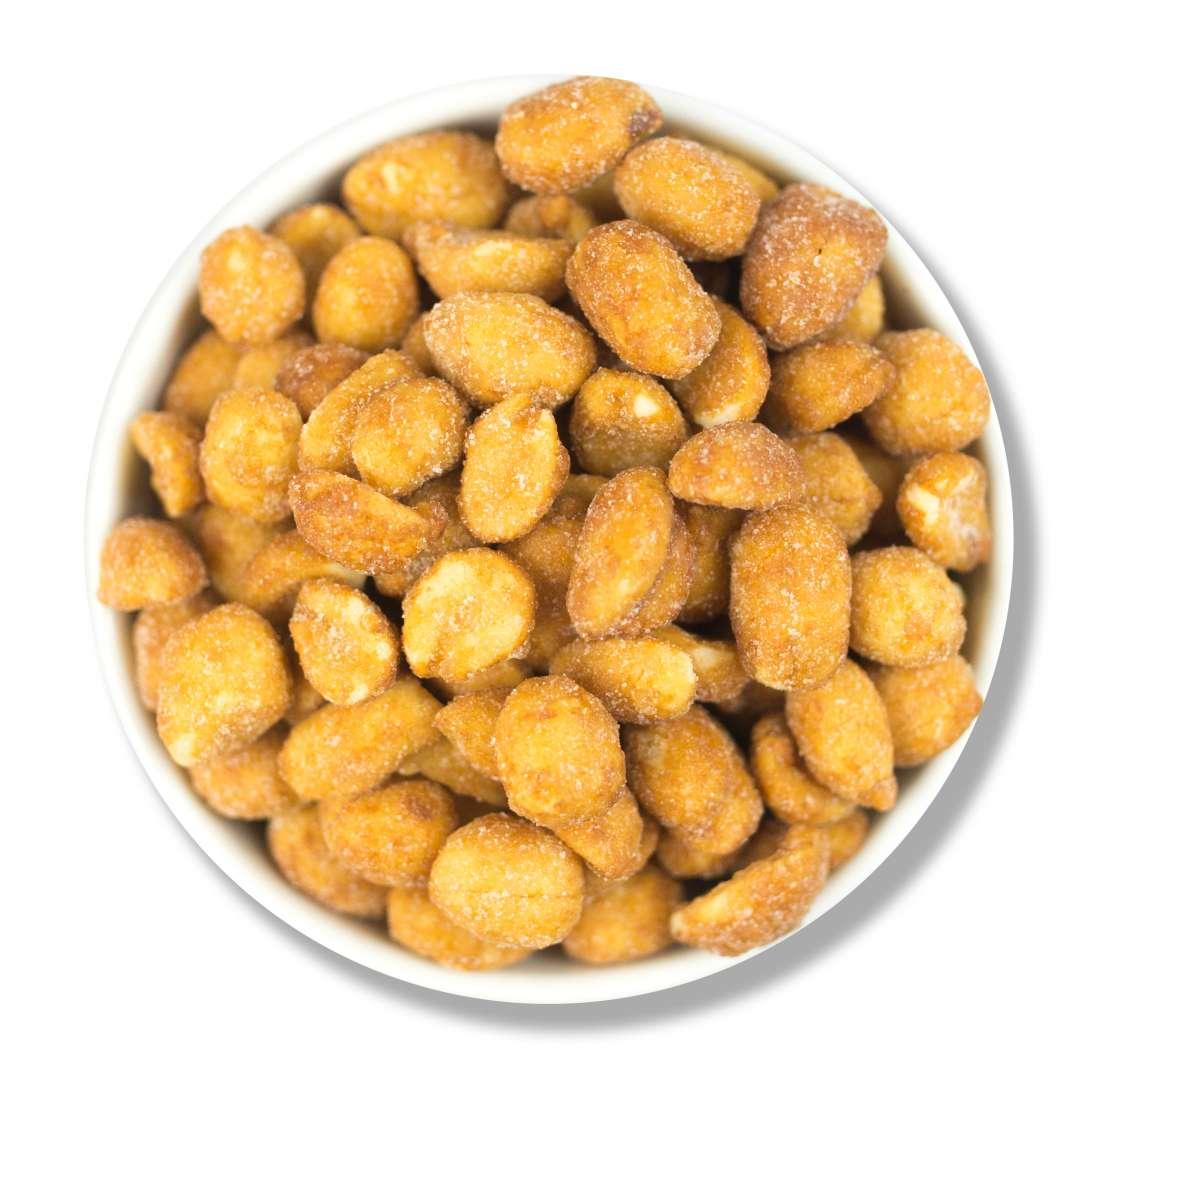 Gesalzene Erdnüsse mit Honig   Erdnüsse